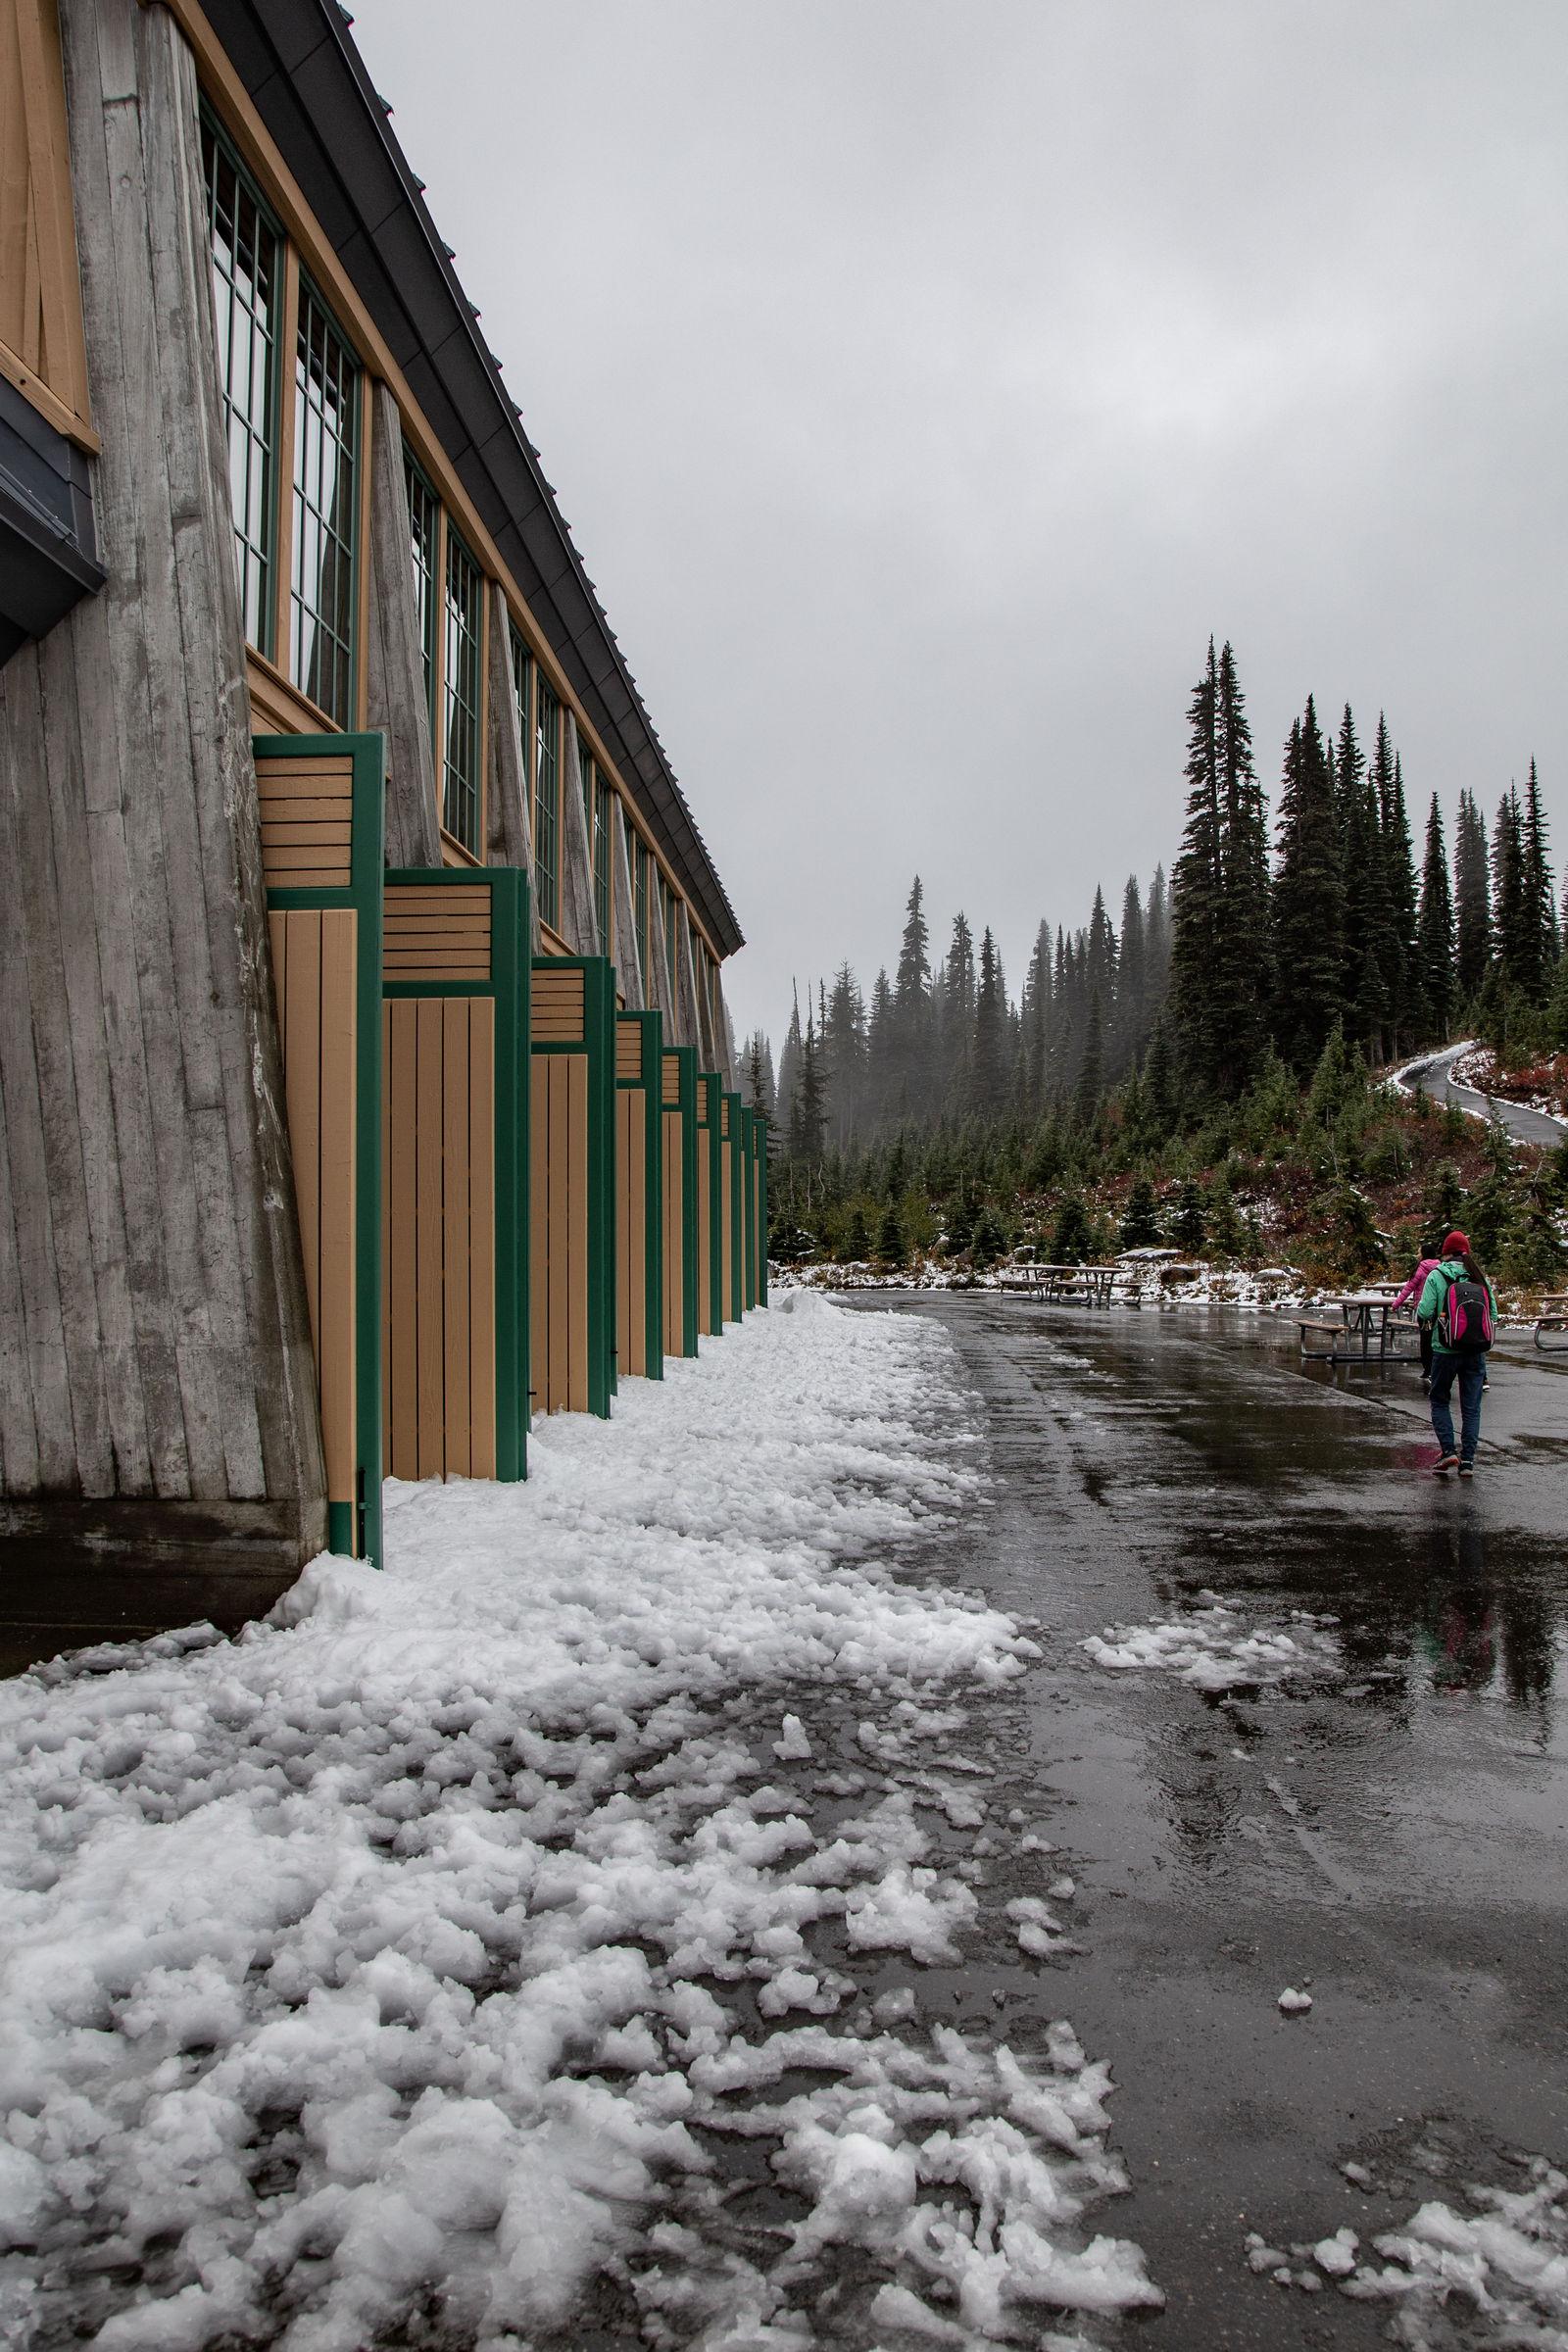 Nieve acumulada junto al centro de visitantes